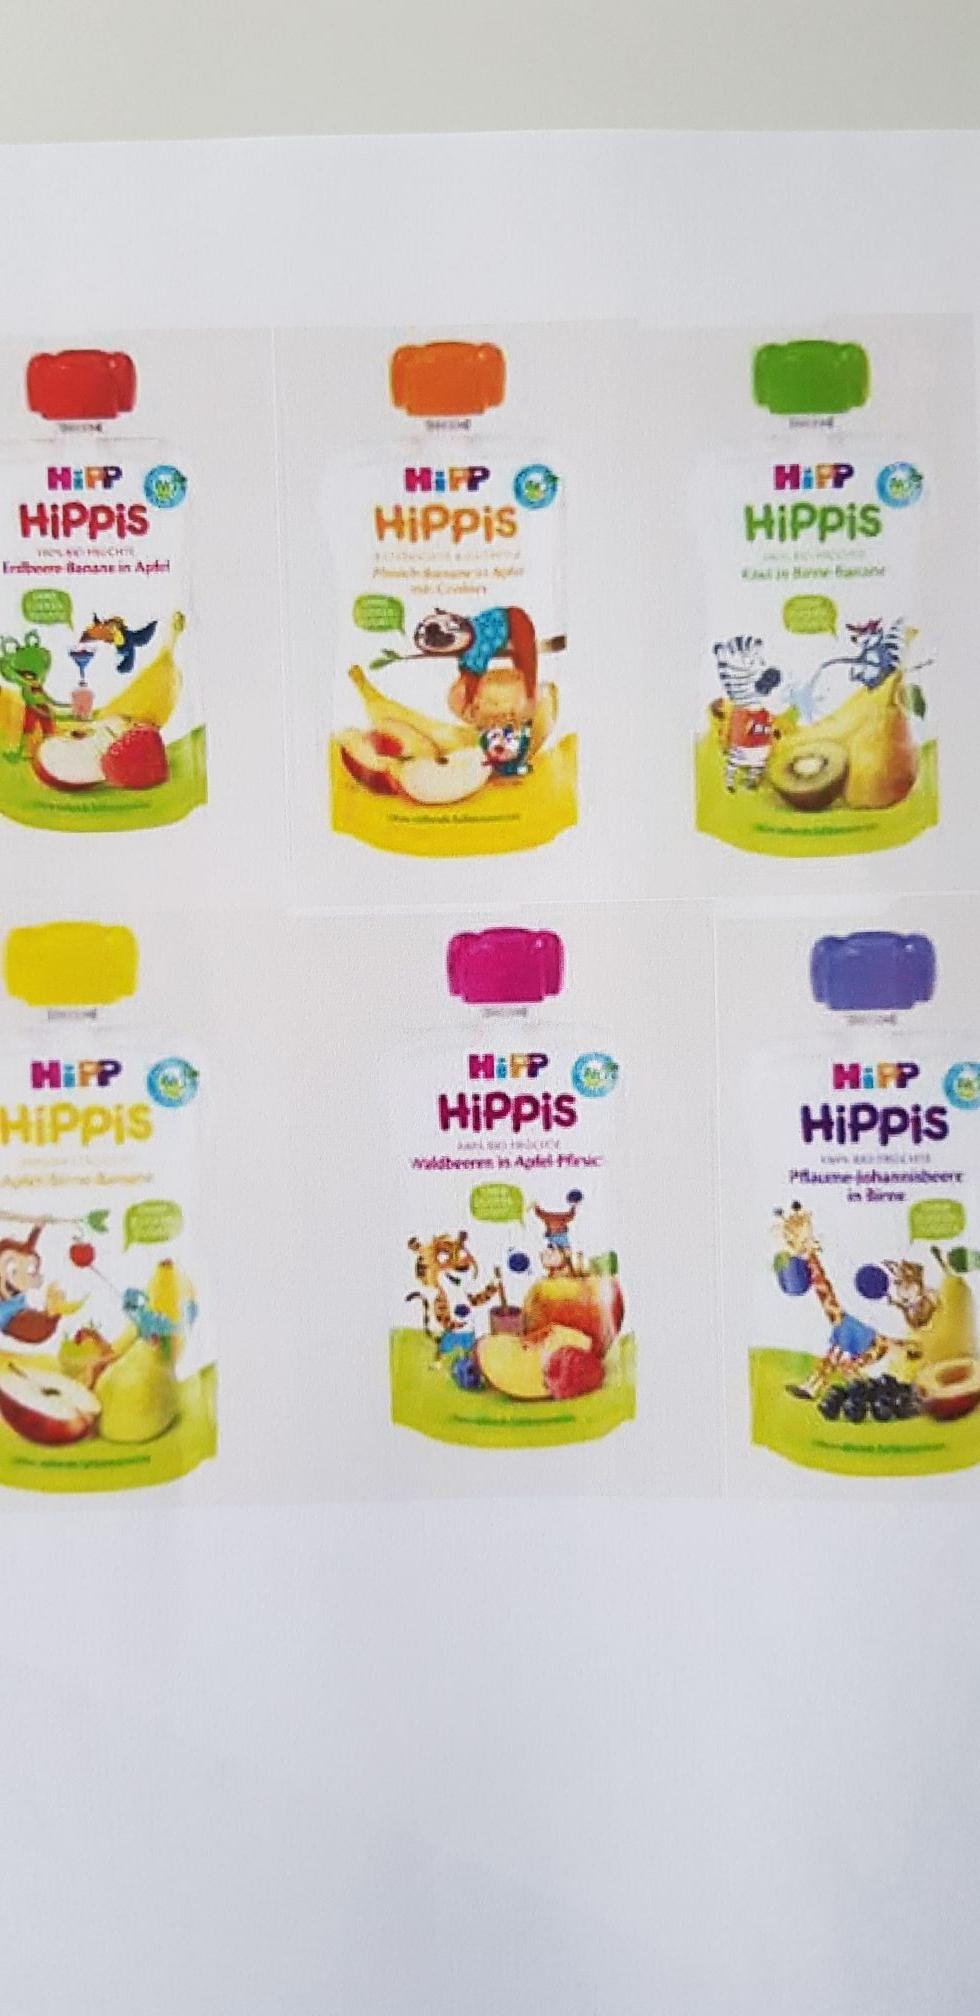 [ROSSMANN] Hipp Hippis Quetschbeutel  / Quetschies 100 ml für 0,27 € statt 0,75 €